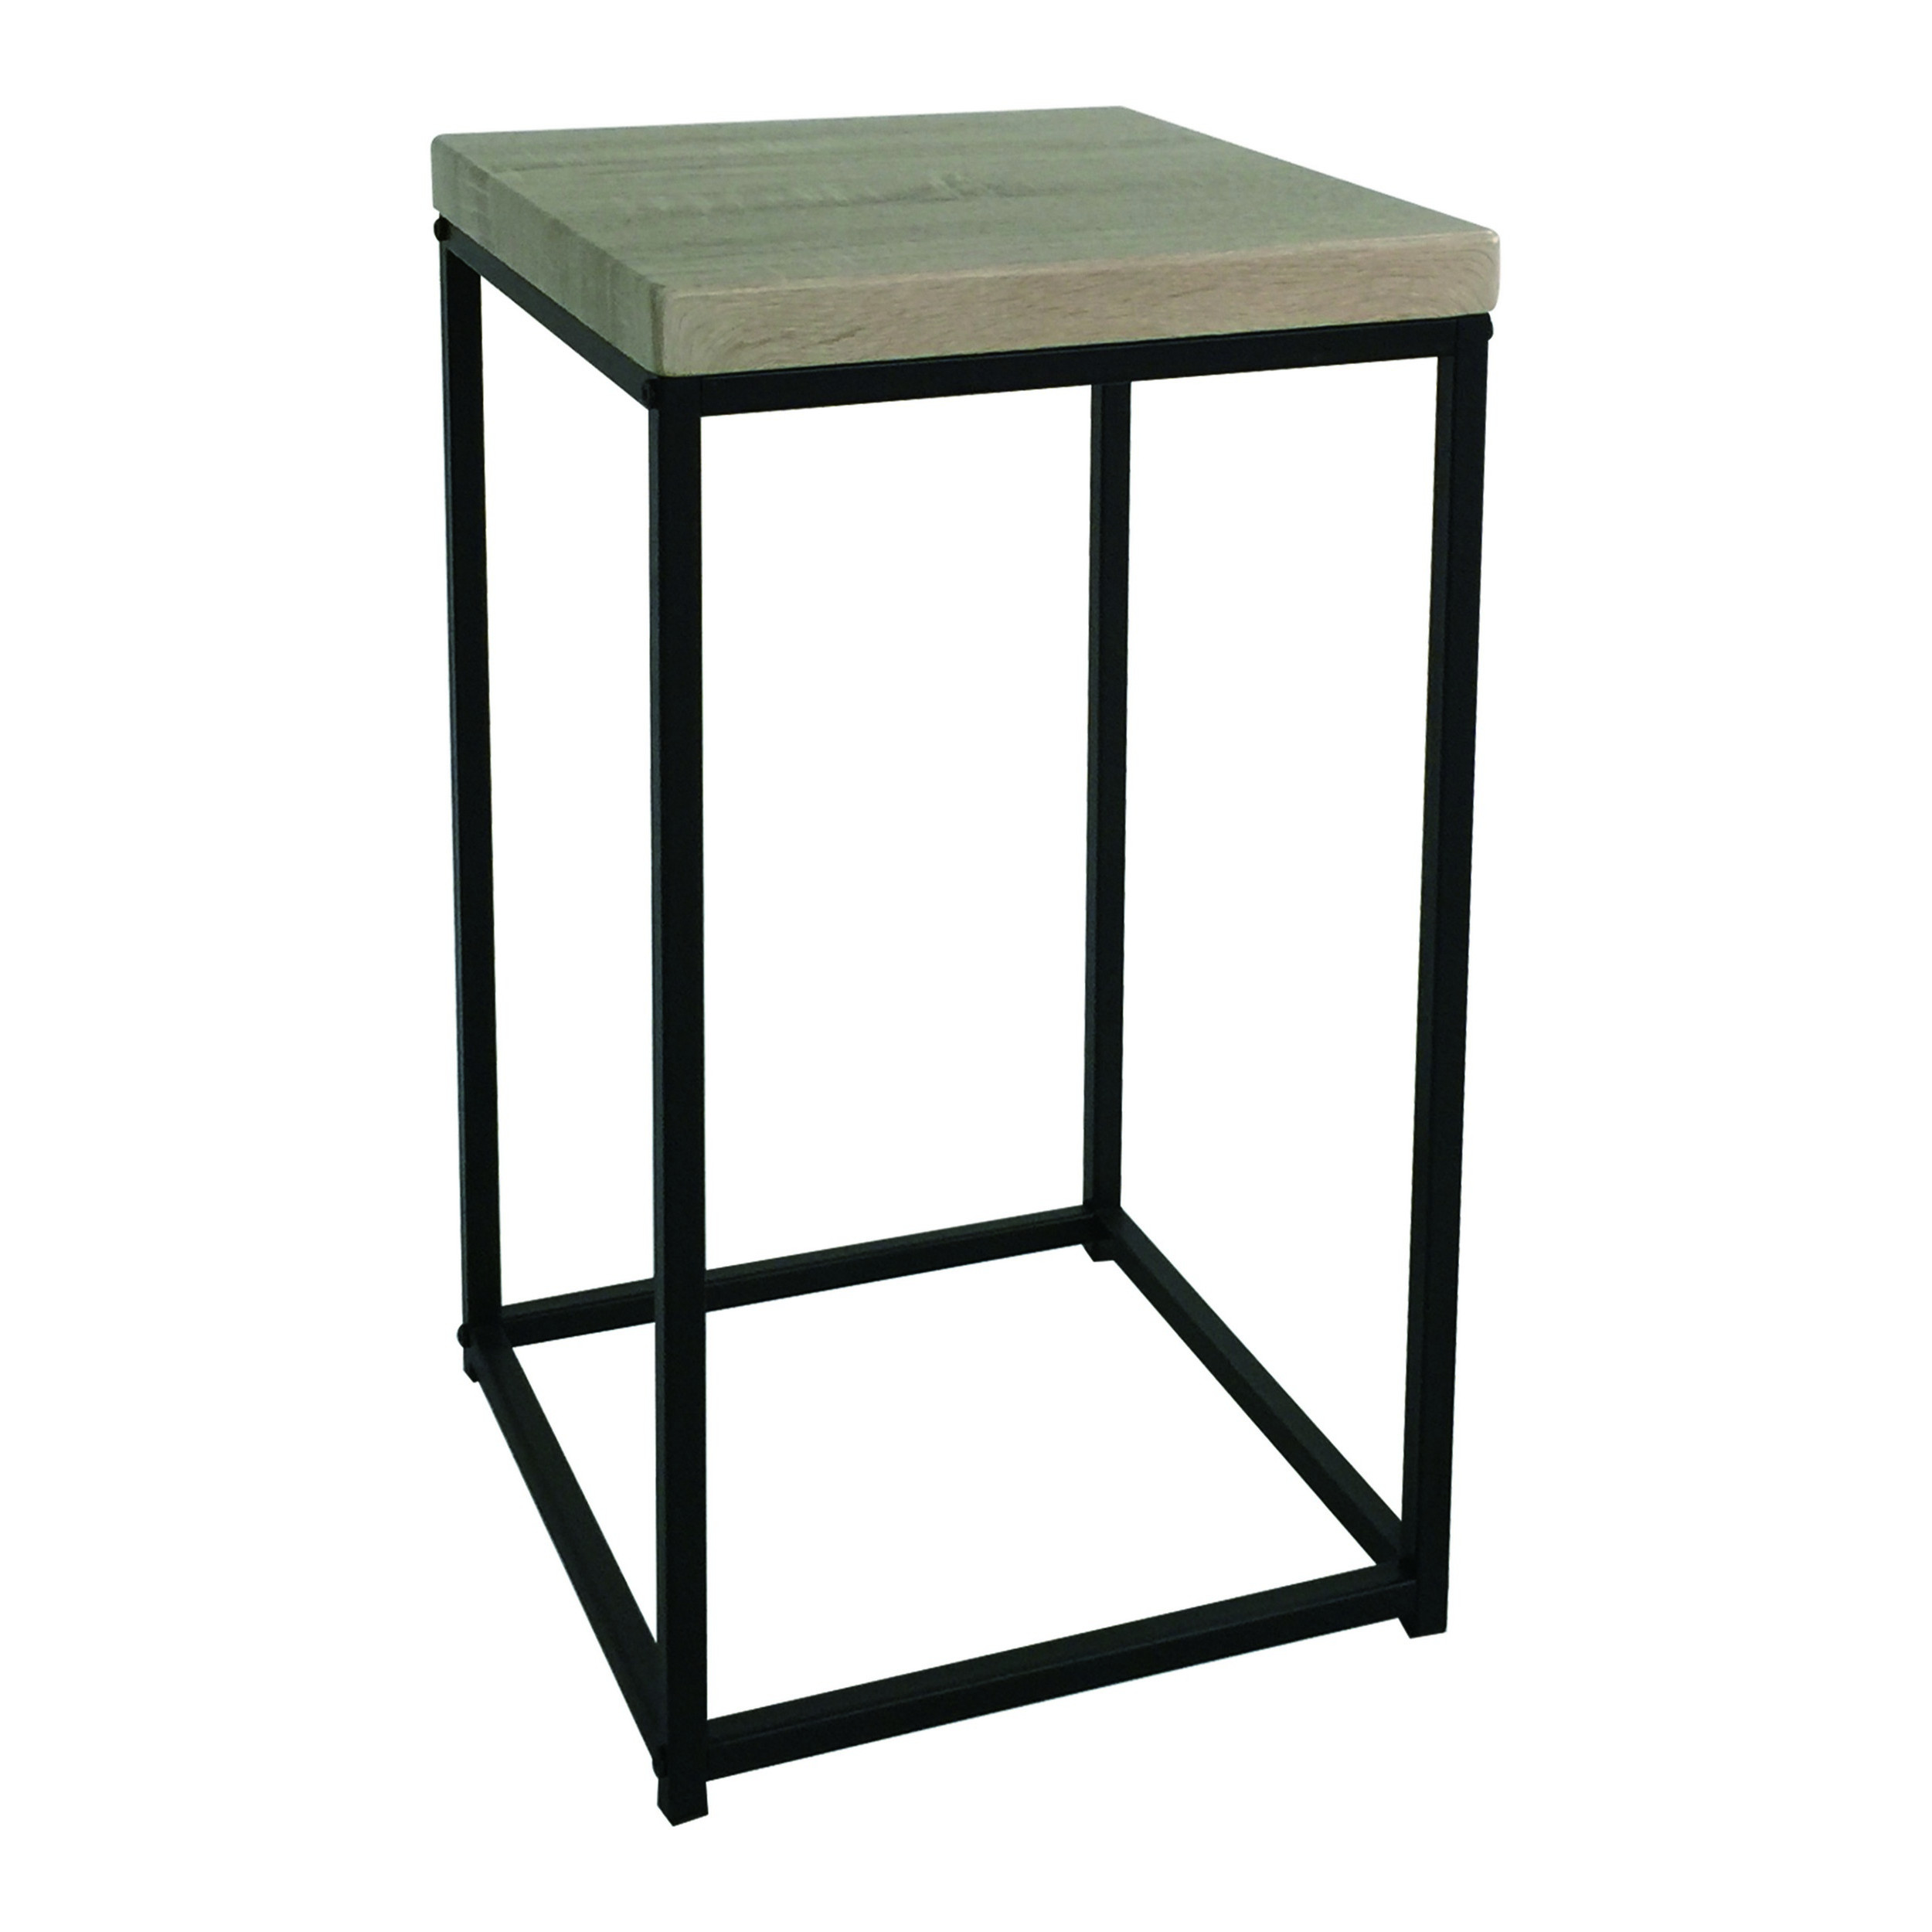 Coffee Table Pictor H 60 cm   Black, Wood